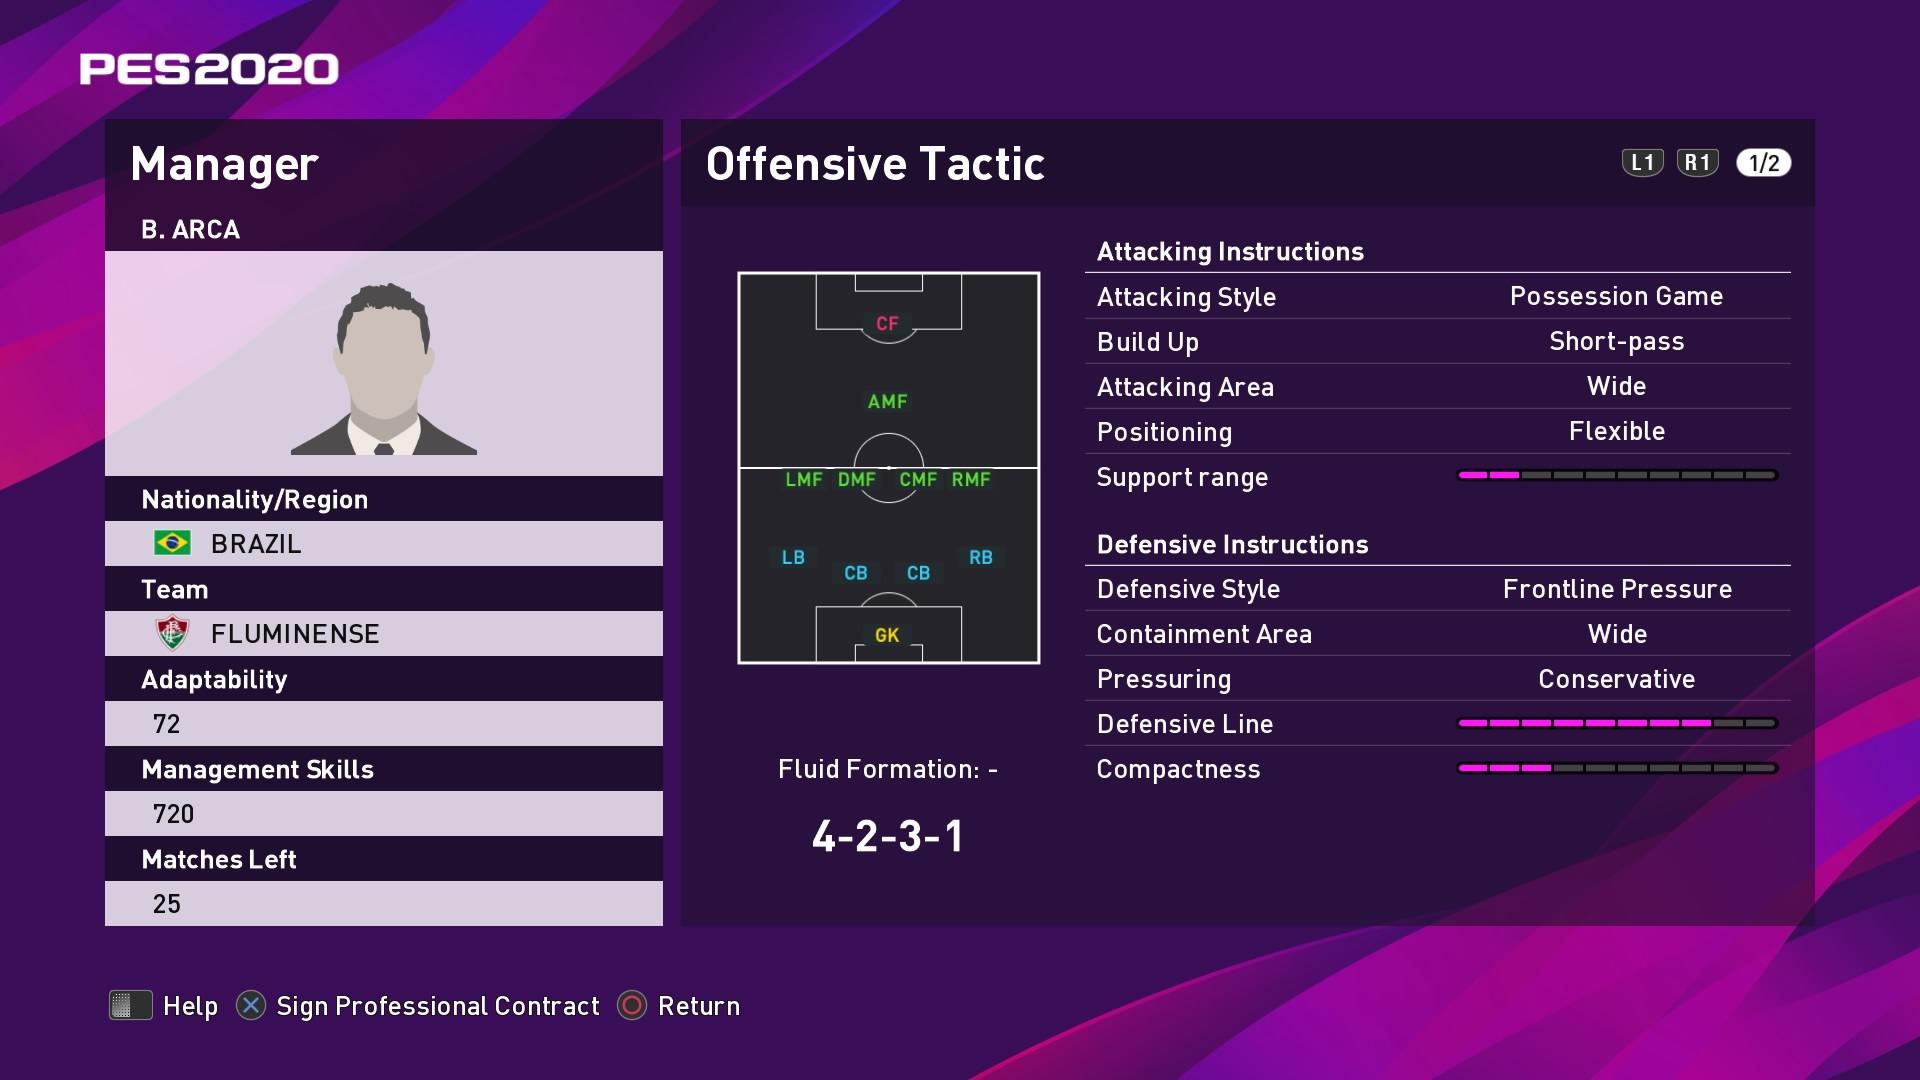 B. Arca (Odair Hellmann) Offensive Tactic in PES 2020 myClub